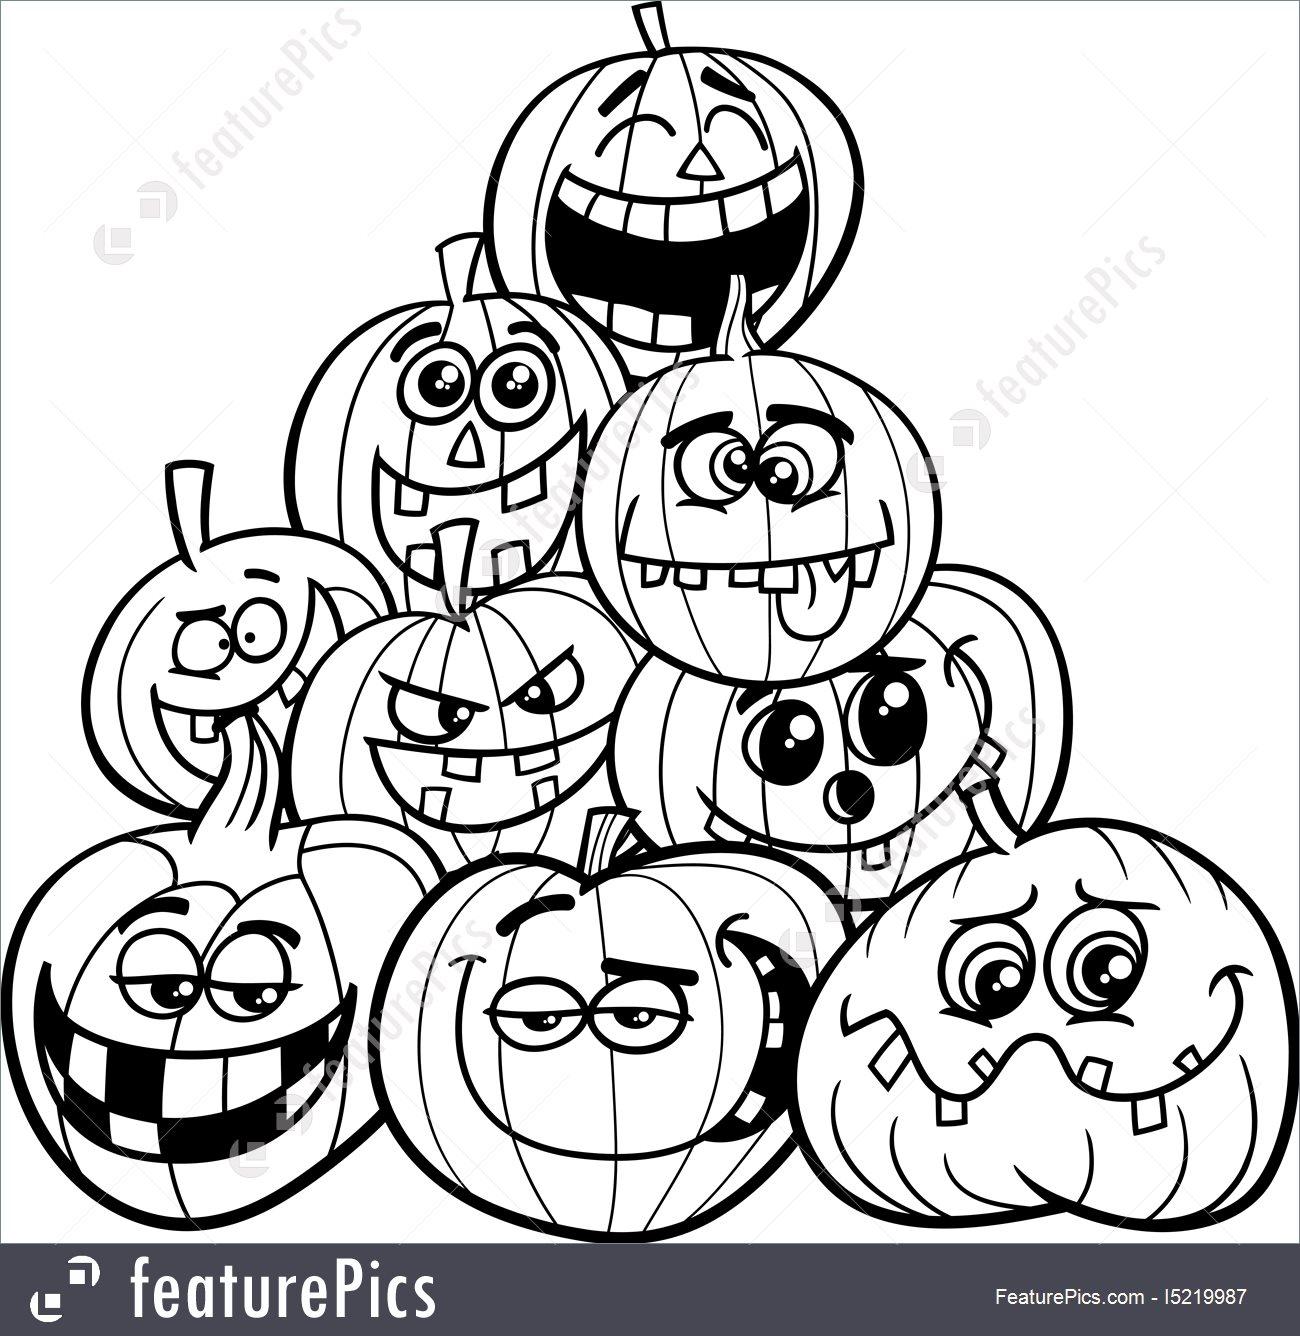 Halloween Pumpkin Coloring Pages Printables Coloring Pages Halloween Pumpkins Stock Illustration Pumpkin